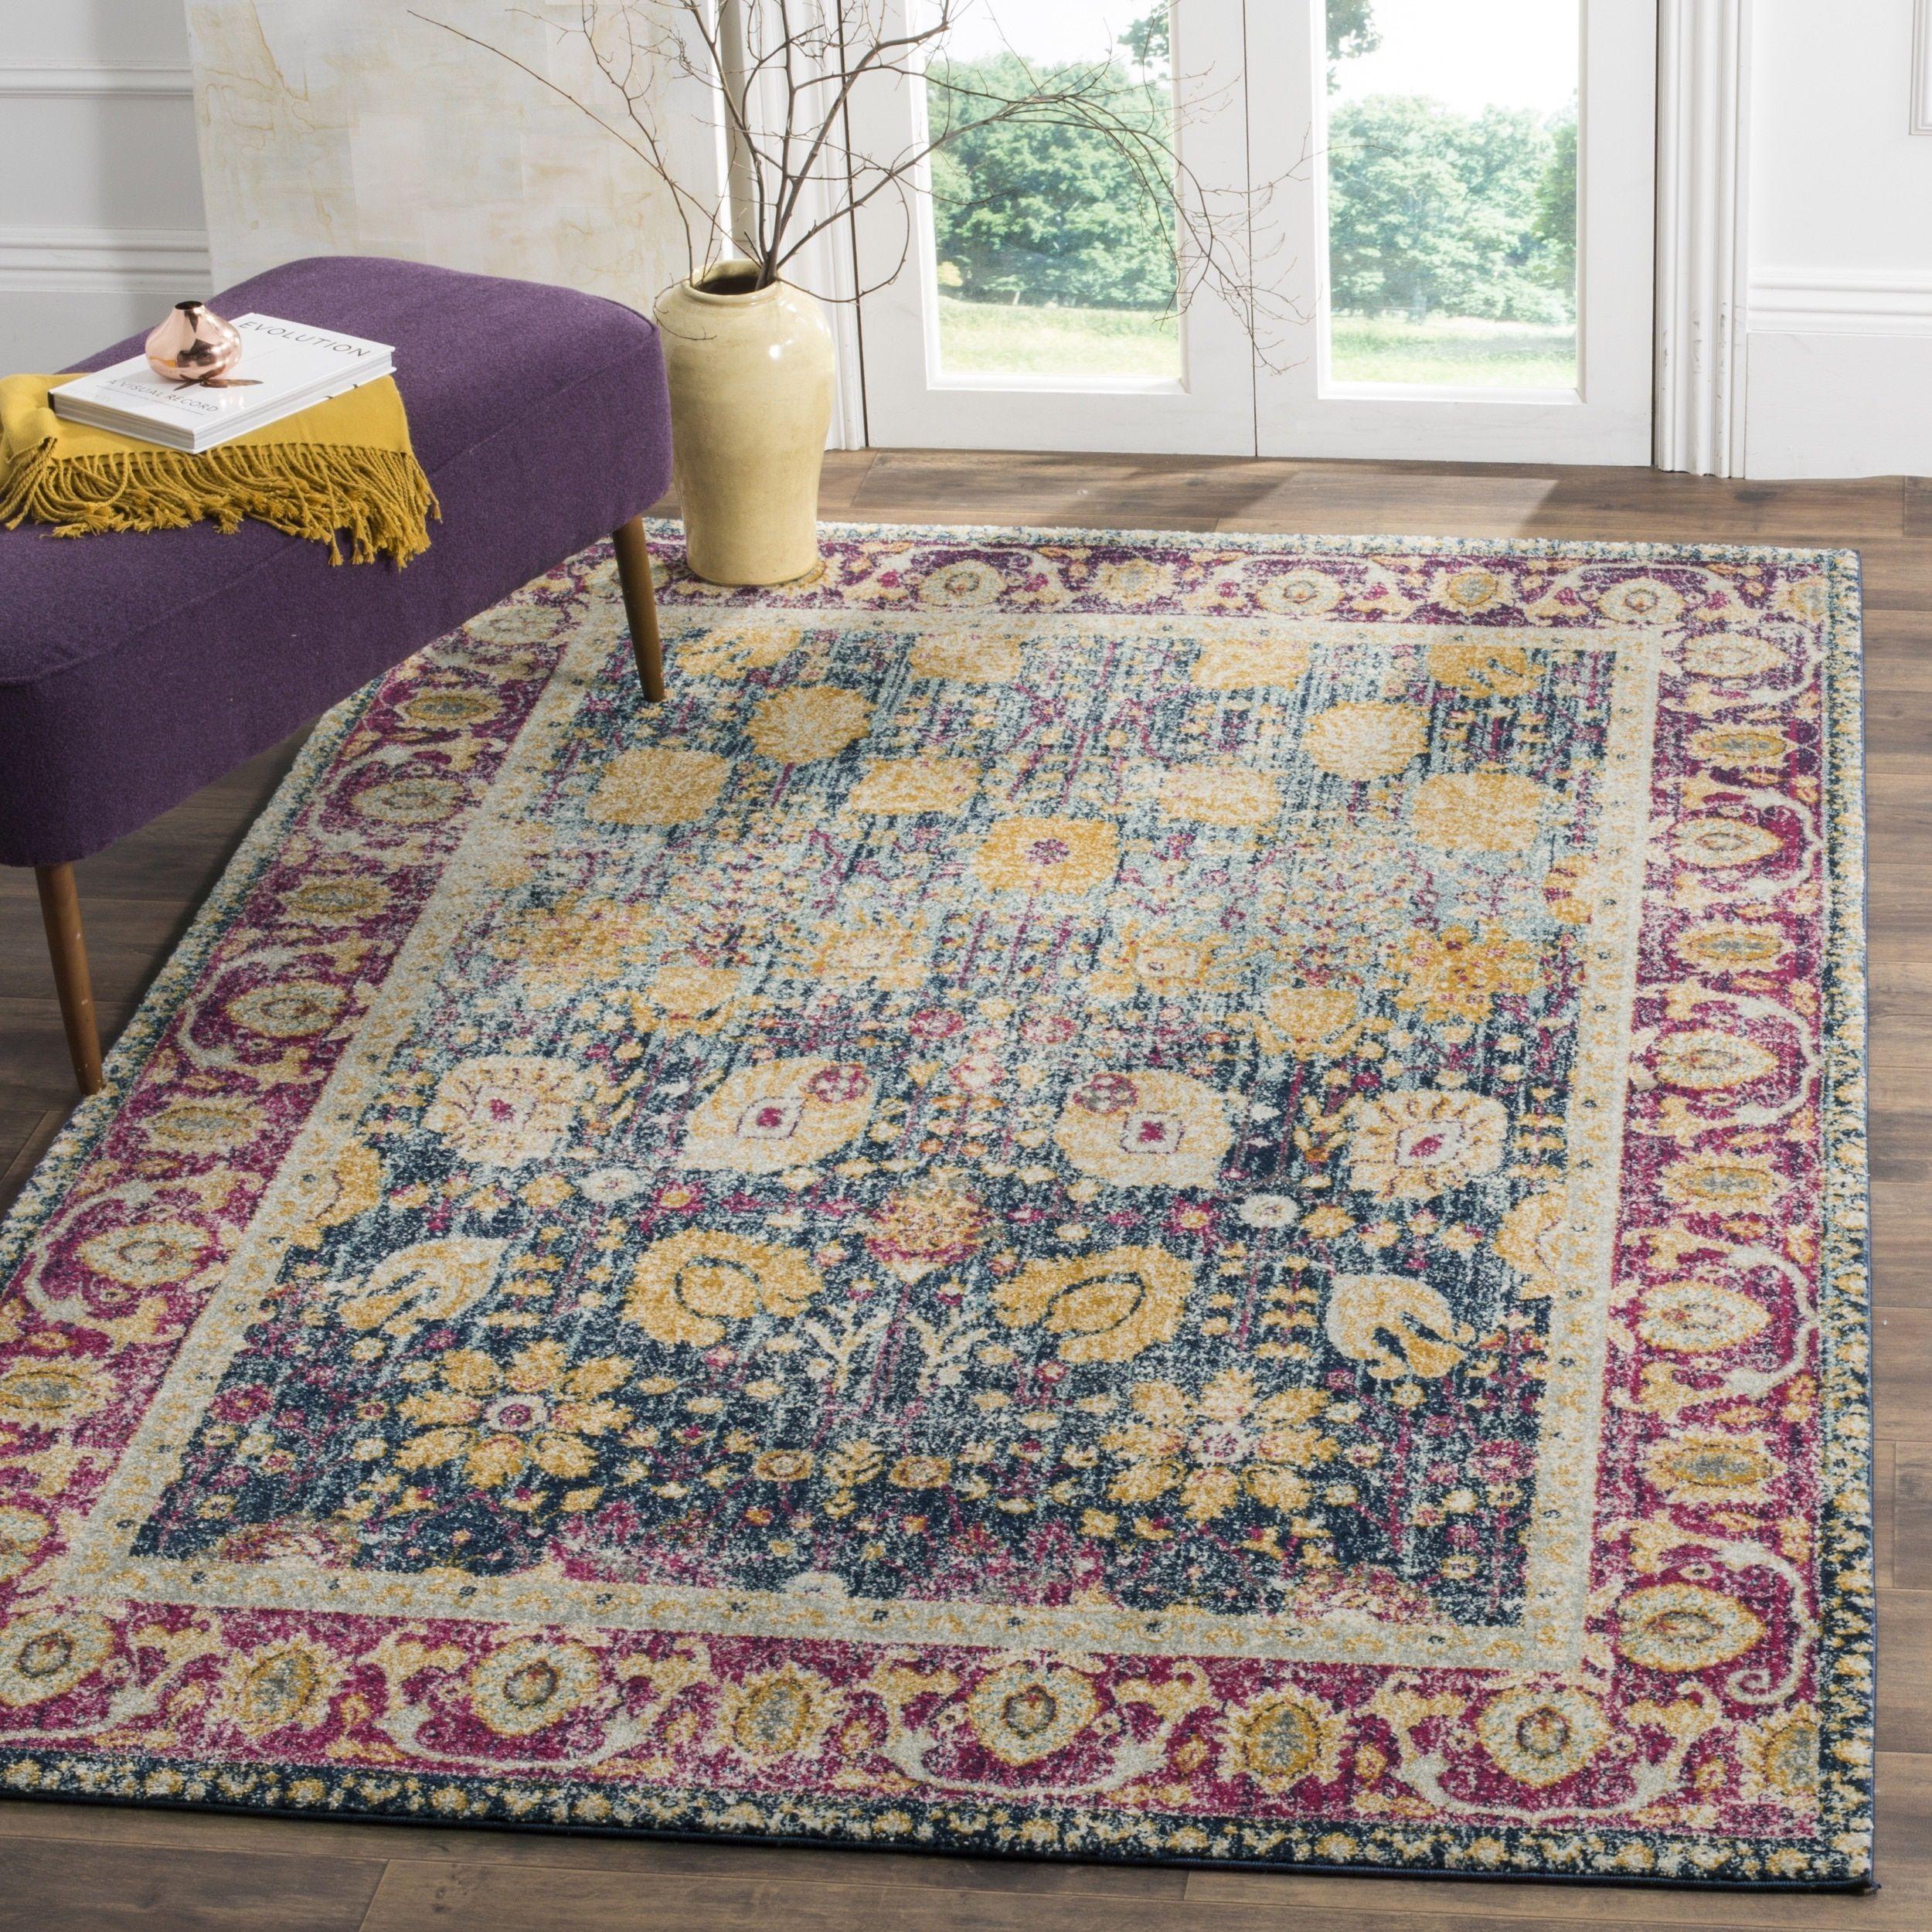 rug mashad wool atlanta meshed arabian tabriz products carpet persian antique bohemian hand woven horizontal